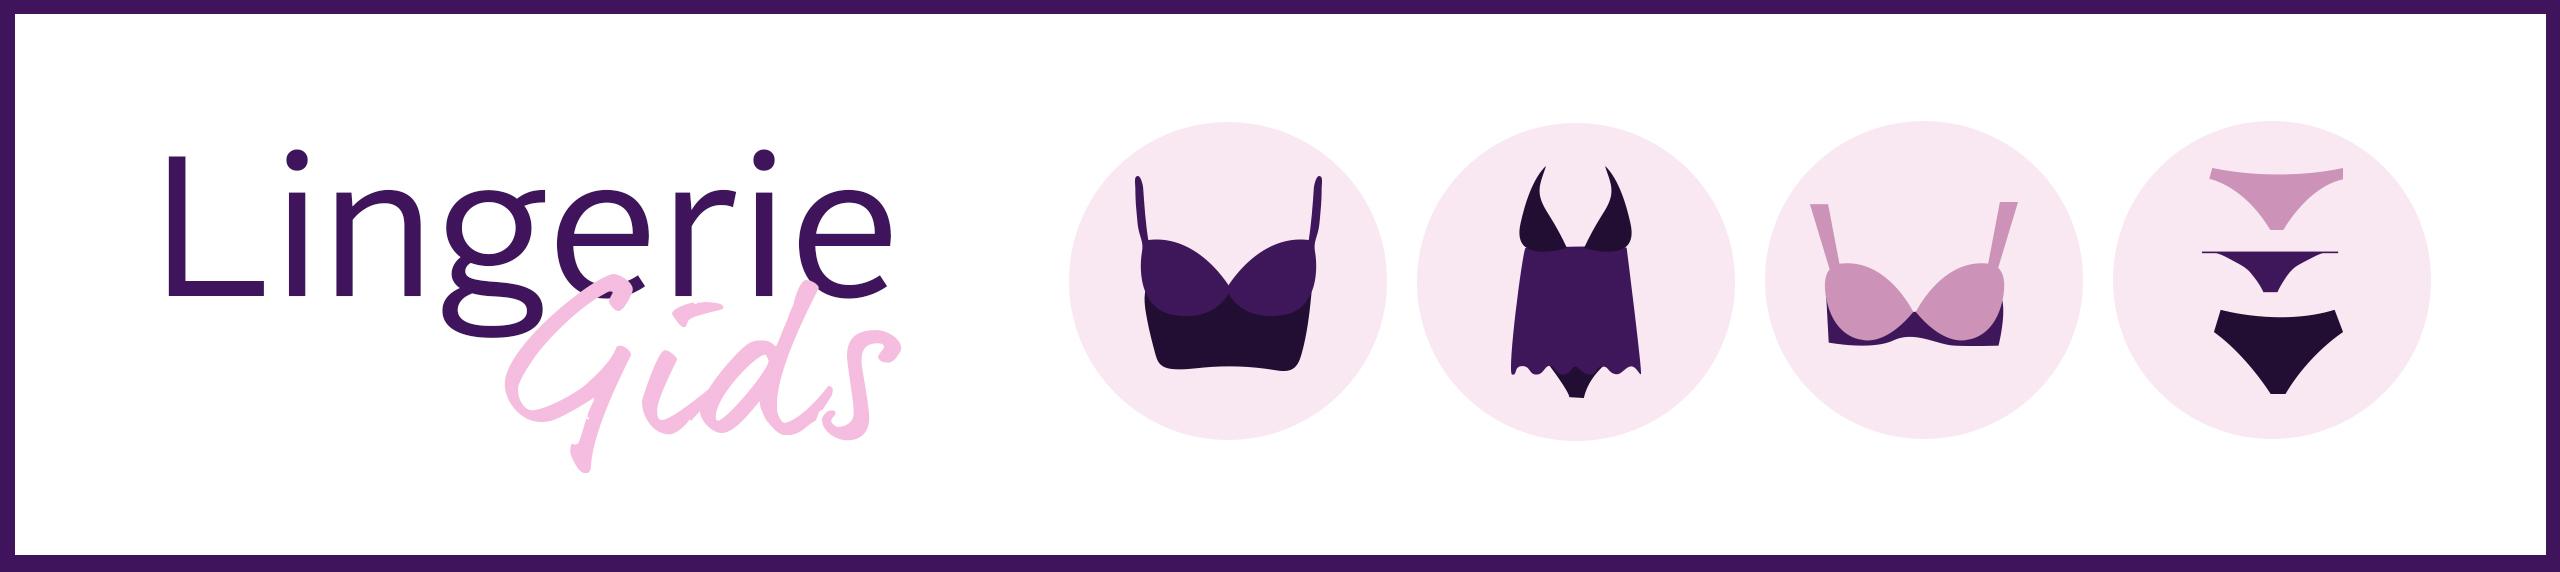 lingeriegids banner